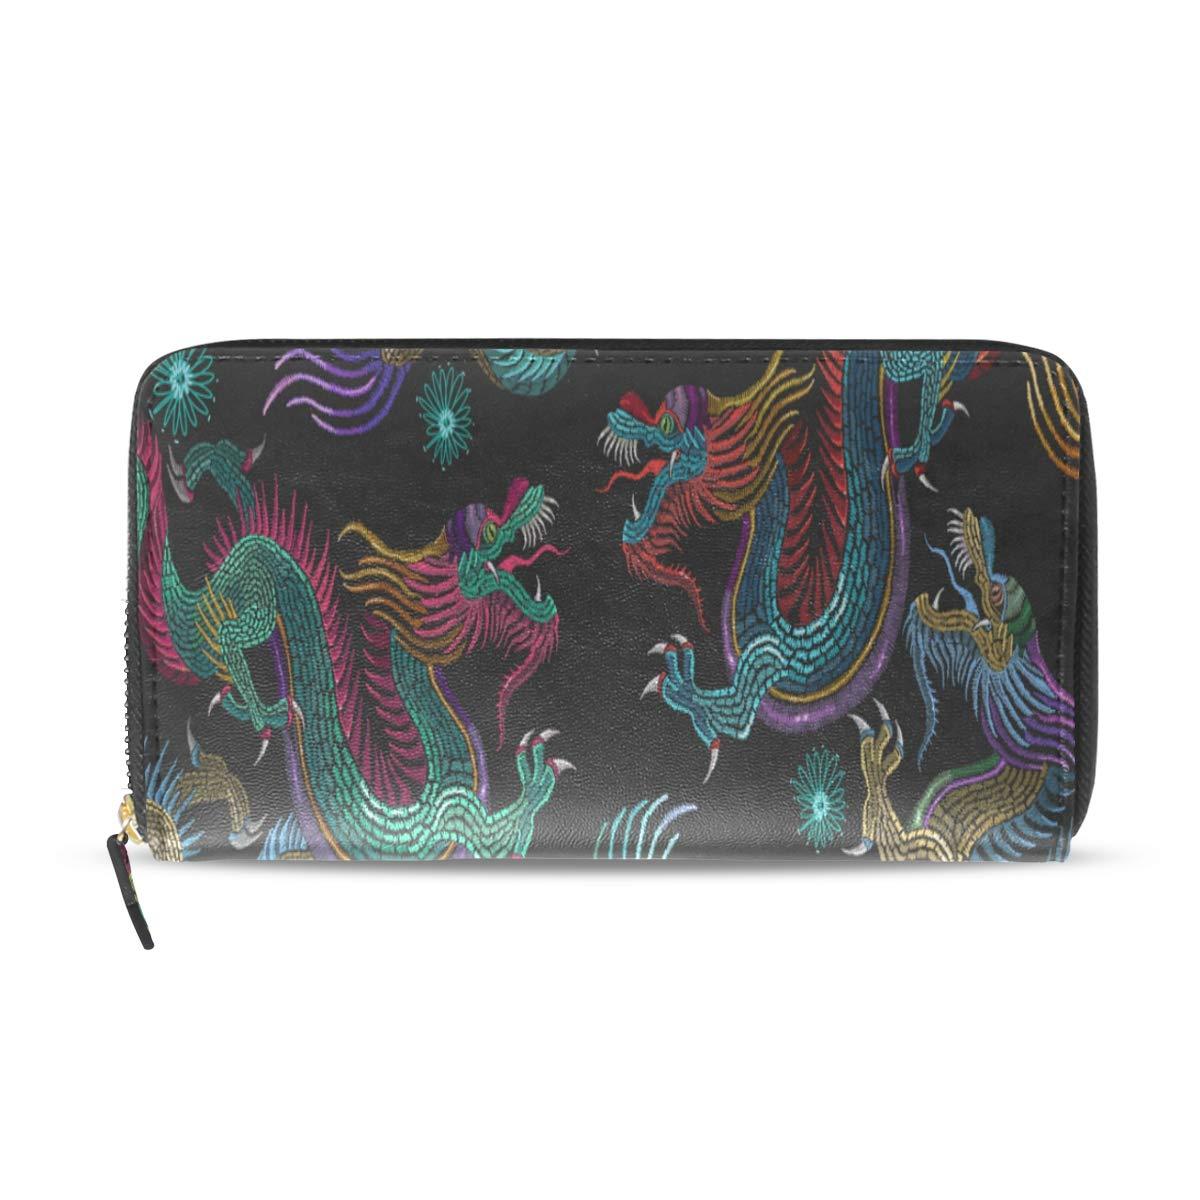 Slim Wallets For Men Cute Space Seamless Pattern Funny Long Passport Clutch Purses Zipper Wallet Case Handbag Money Bag For Lady Women Girl Wallet For Girls